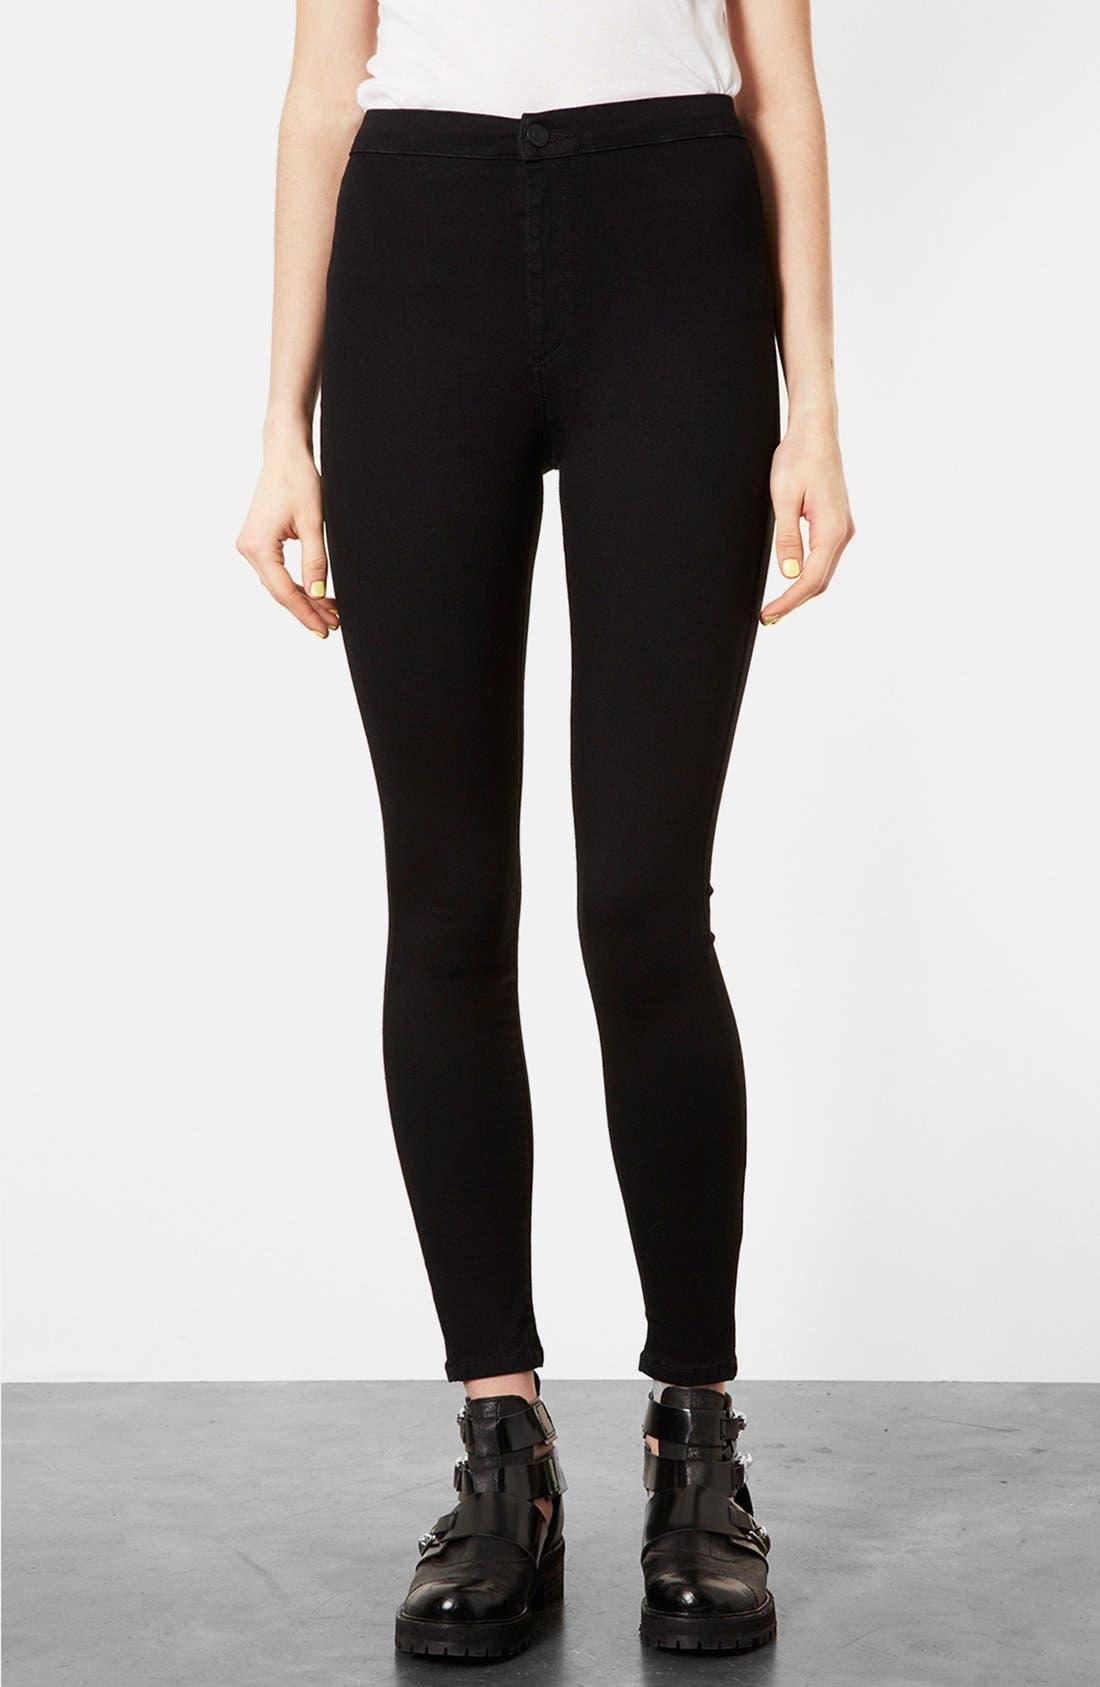 Alternate Image 1 Selected - Topshop Moto 'Joni' High Rise Skinny Jeans (Black)